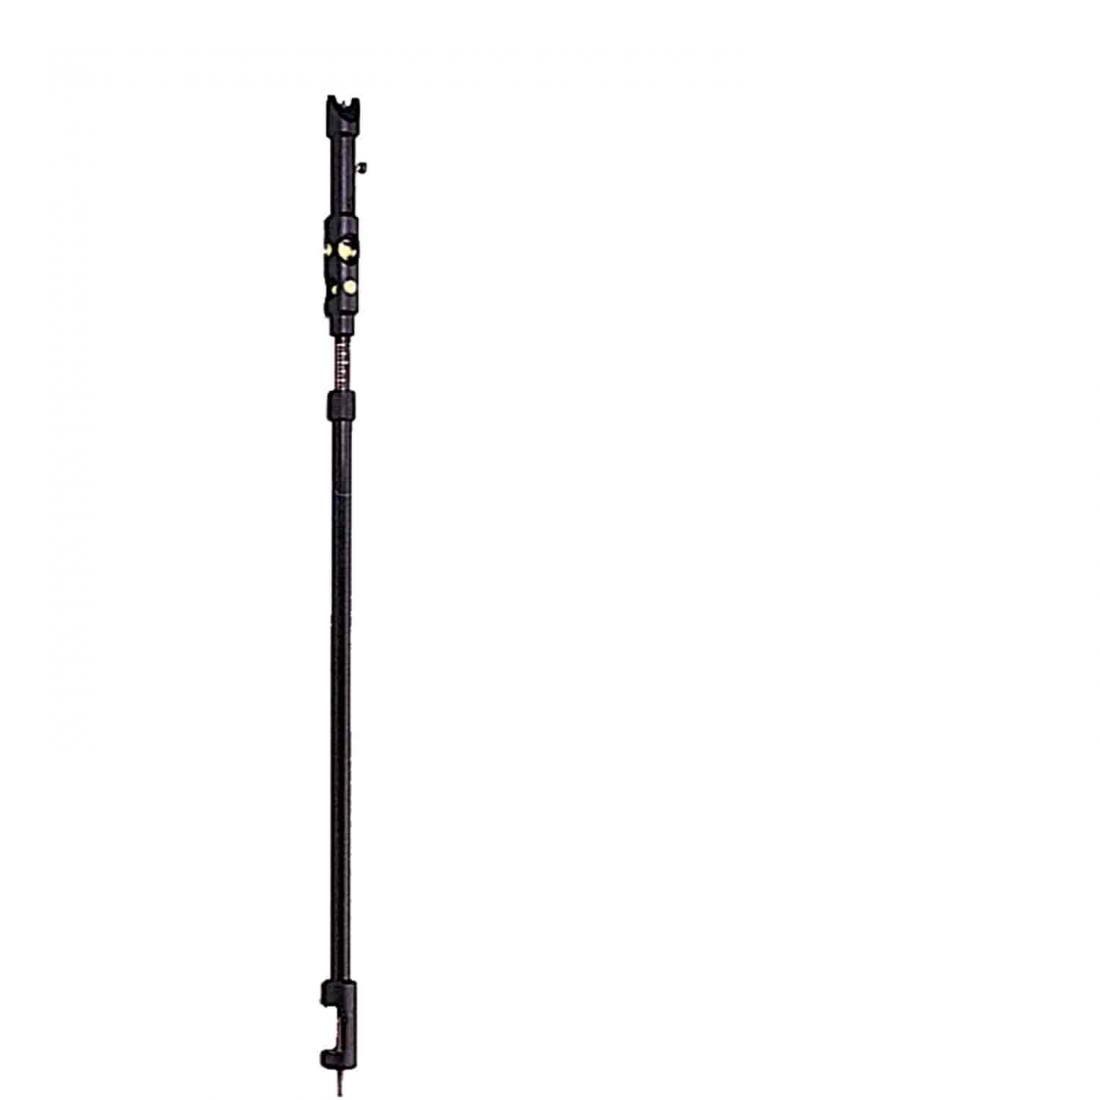 Best Lj 3047 Telescoping Baluster Marking Tool For Wood 640 x 480